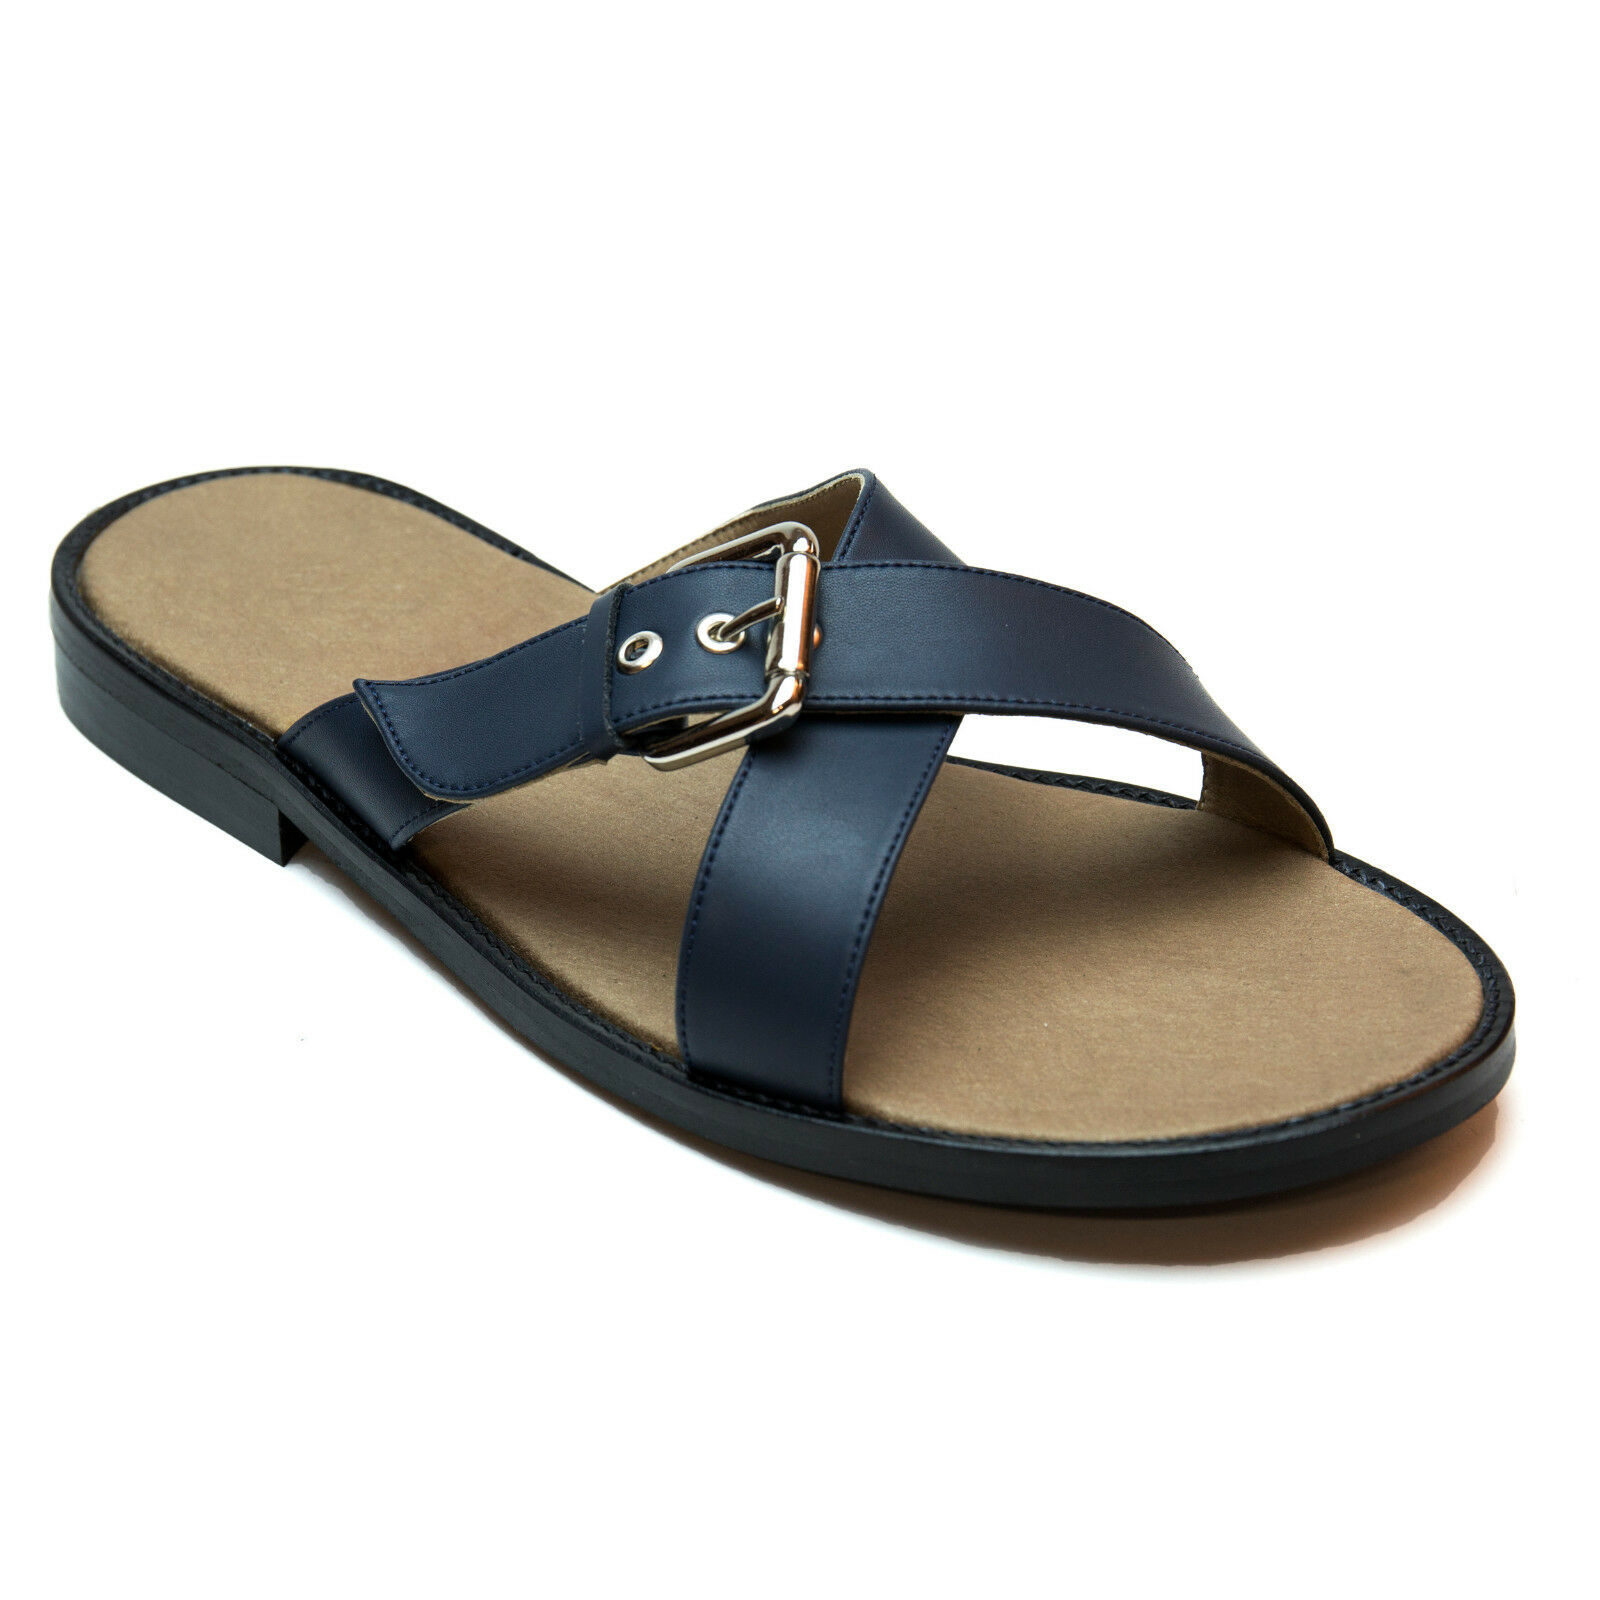 Nae - Vegan Two crossed straps with metal buckle sandal Sandalia vegana cruzadas